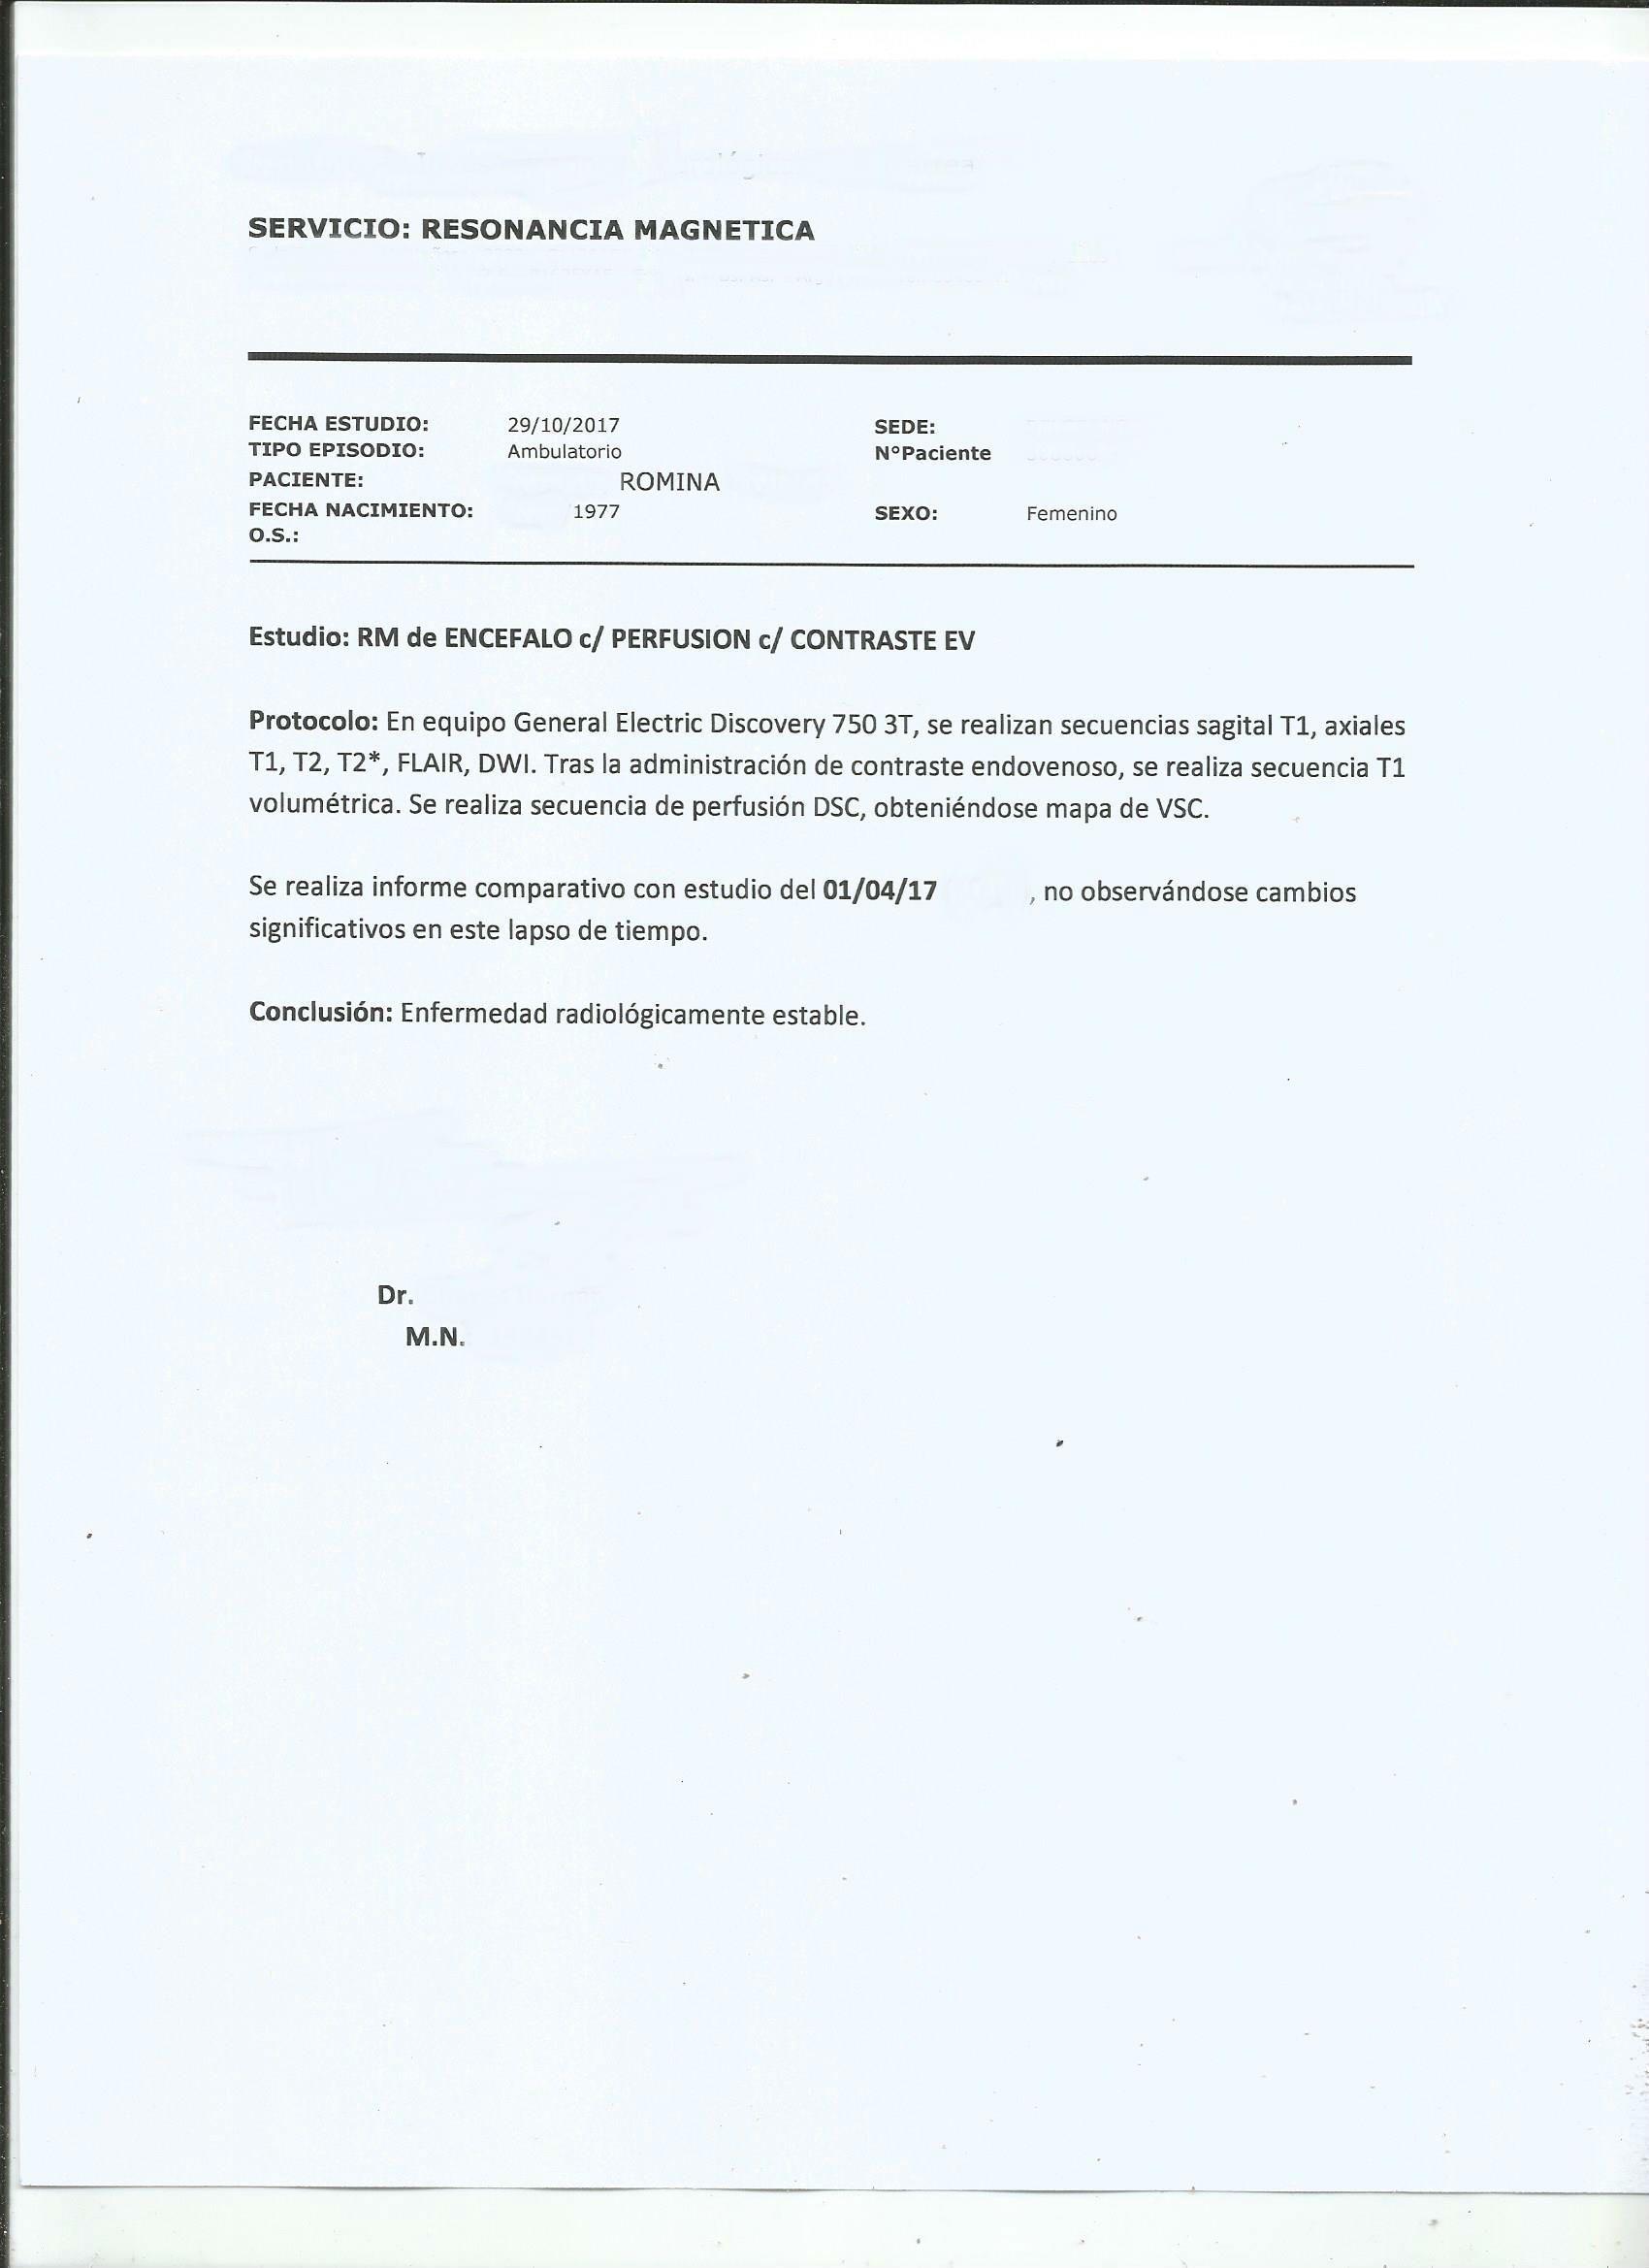 LifEscozul® - Romina 7 - Cáncer Cerebral